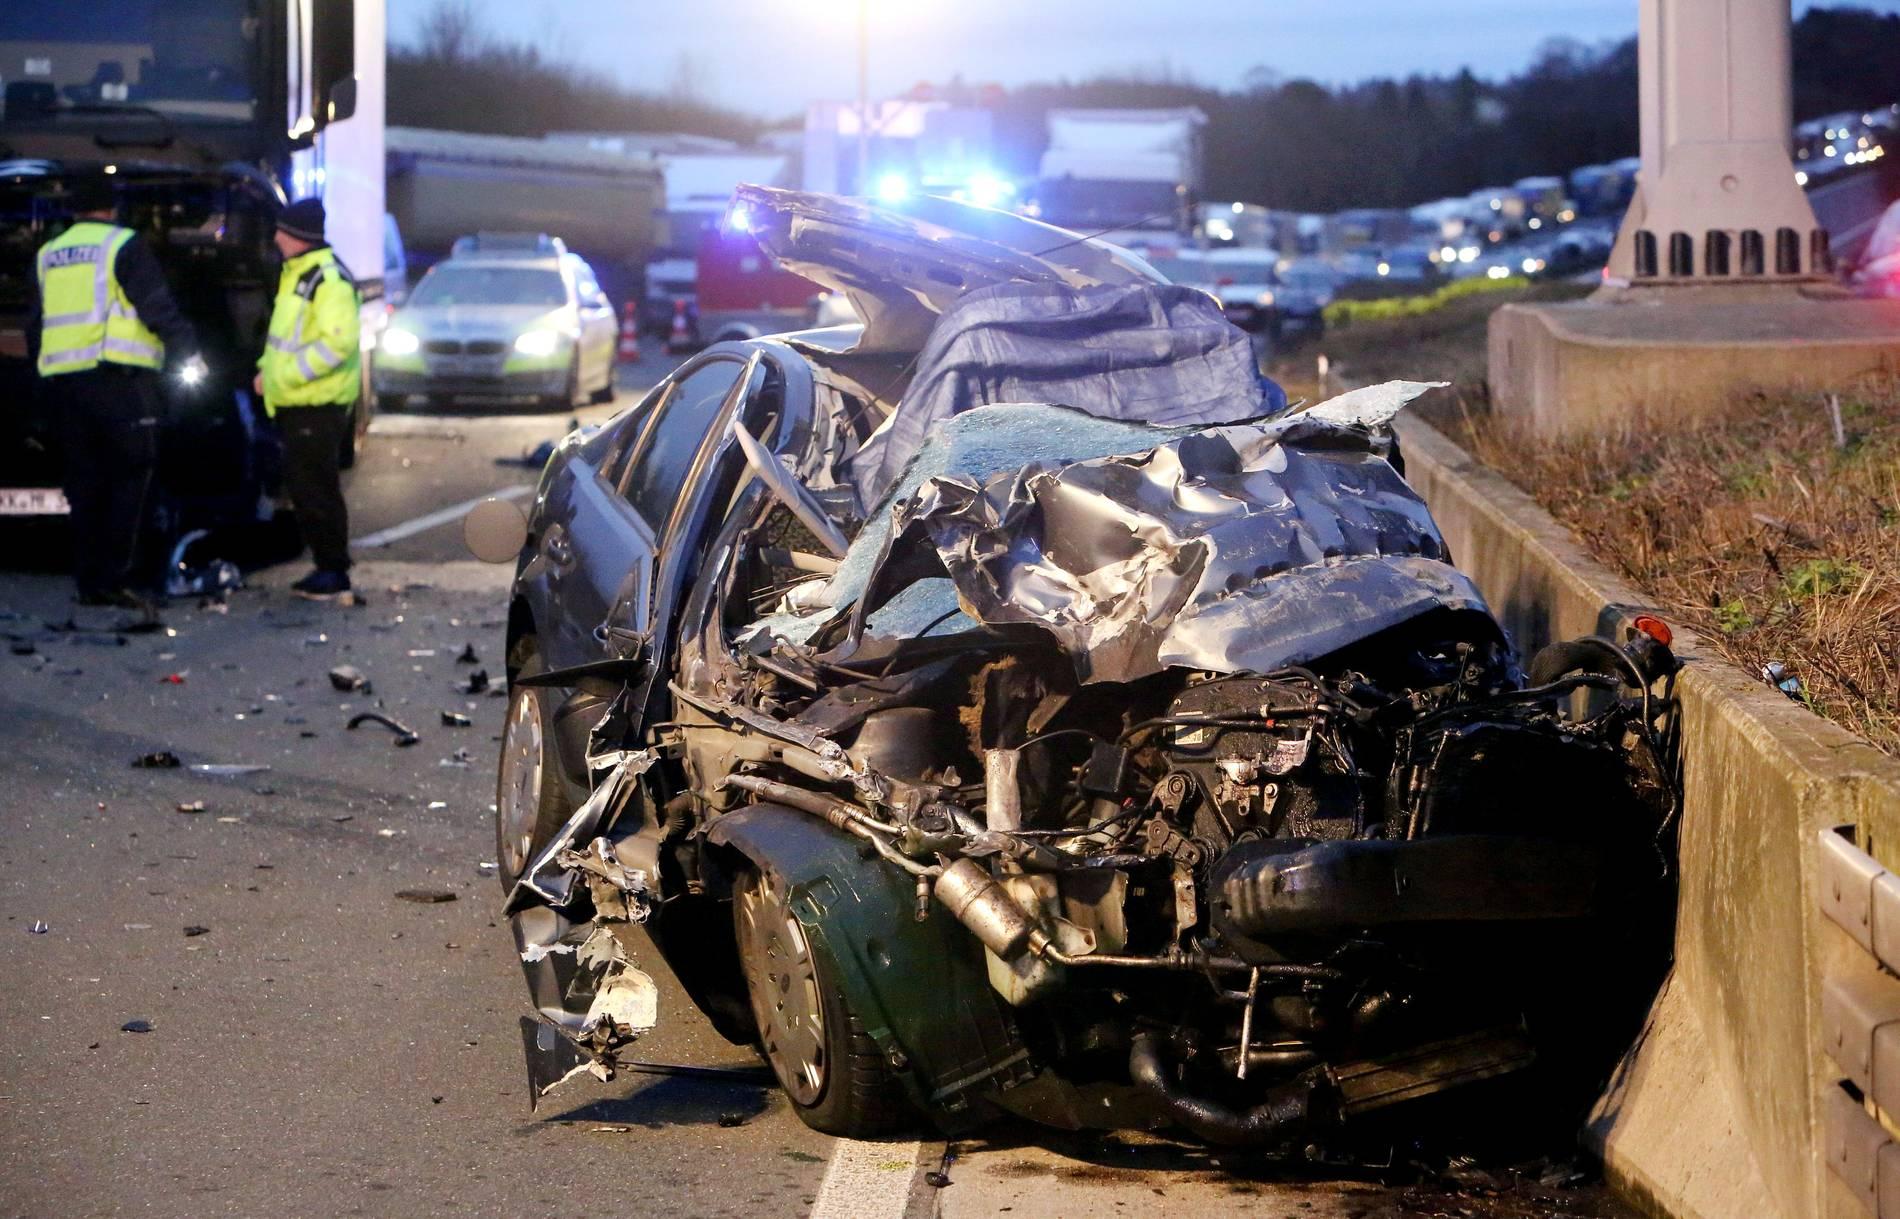 A3 Richtung Koln Todlicher Lkw Unfall Sorgt Fur Sperrung